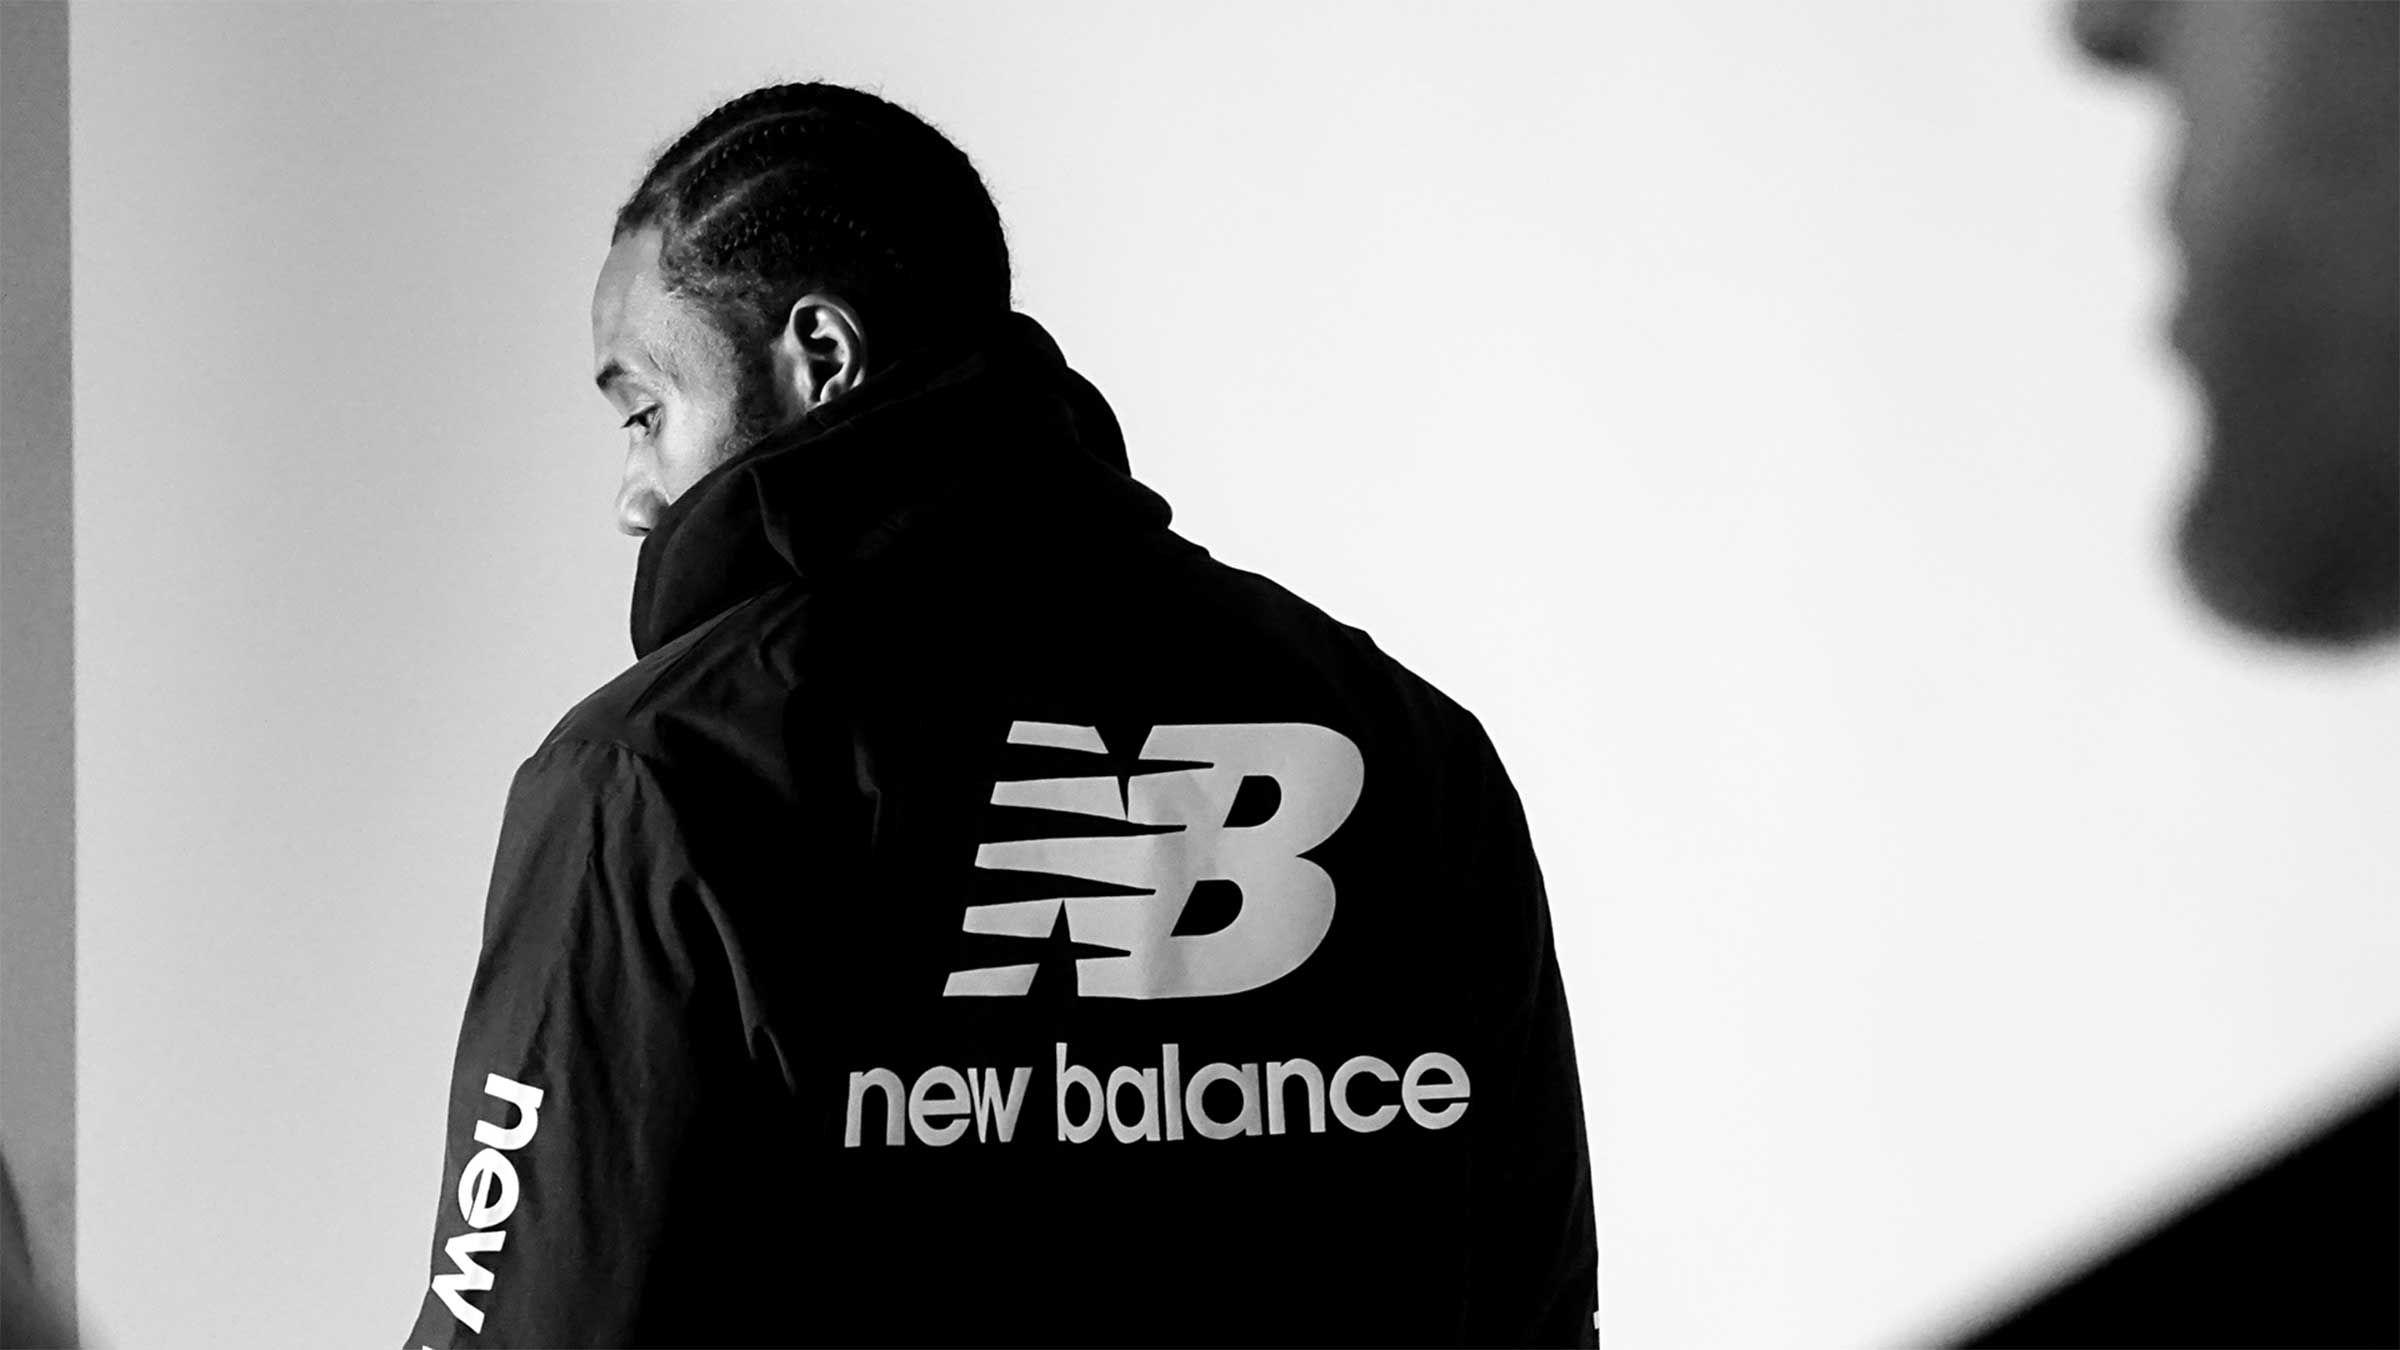 Meditativo antes de Araña de tela en embudo  Kawhi Leonard - Changing the Game - New Balance | Basketball, Basketball  sneakers, New balance